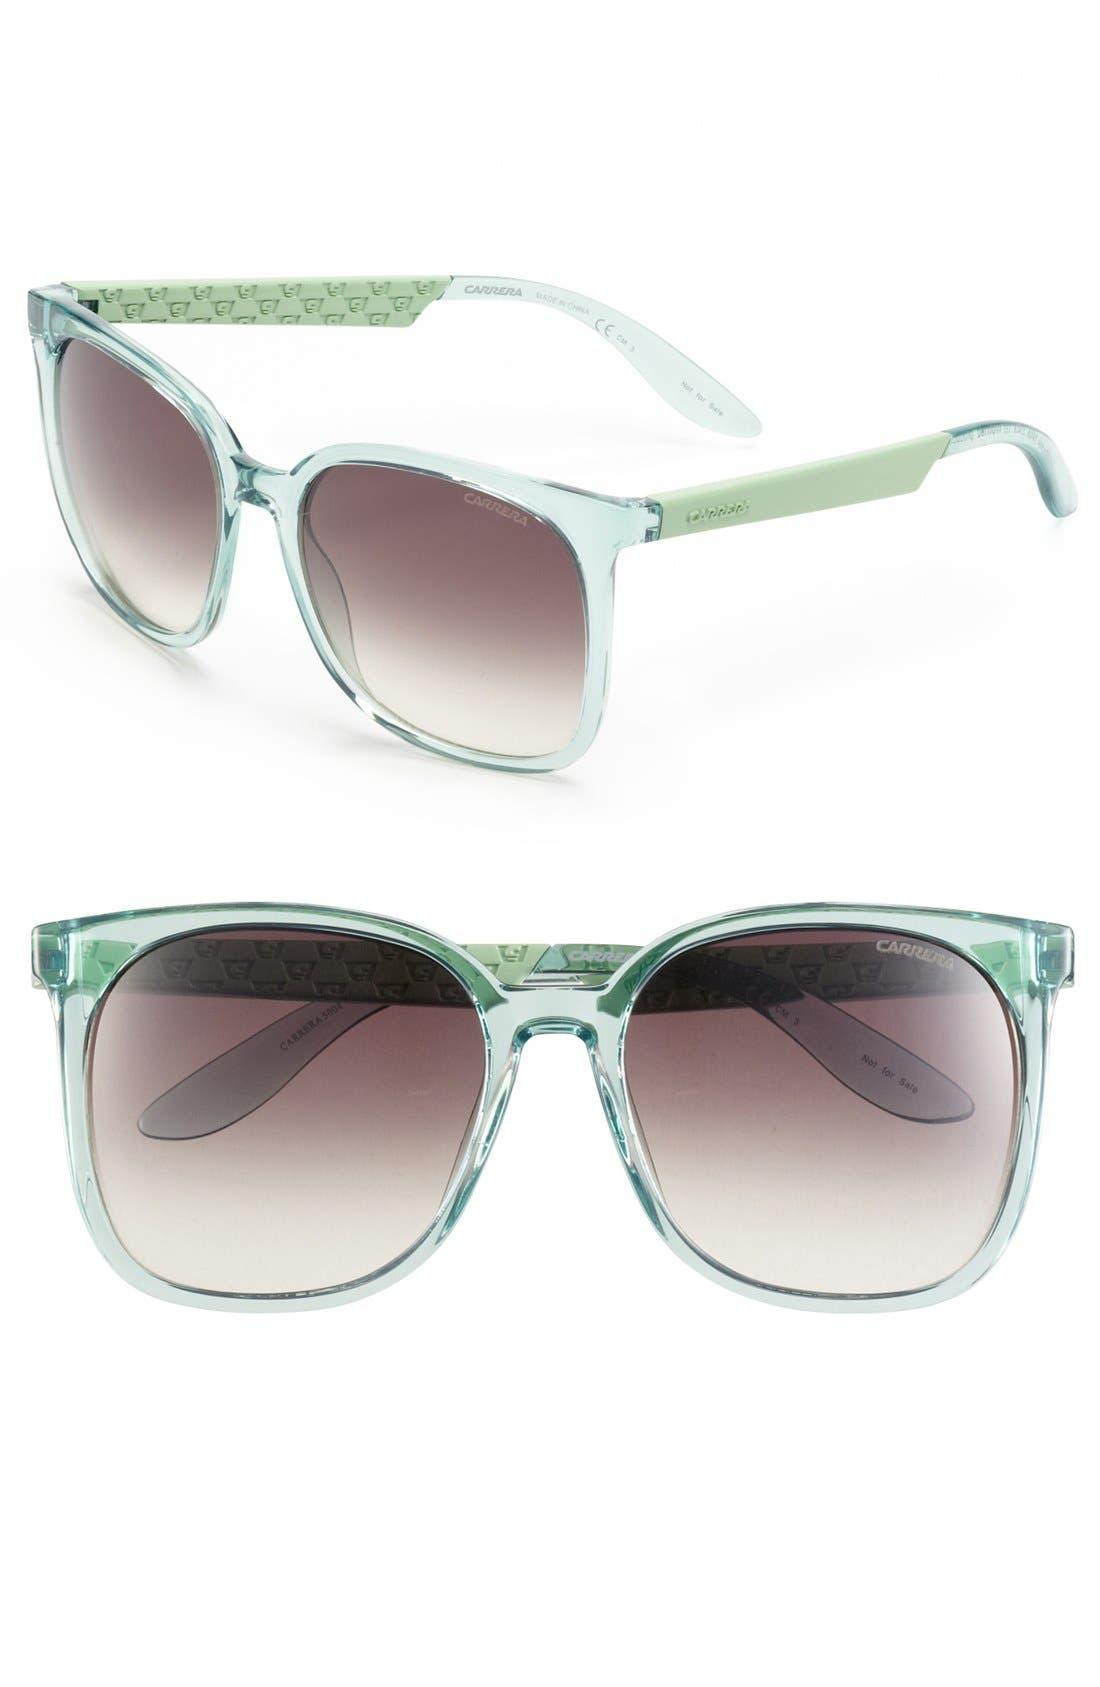 Alternate Image 1 Selected - Carrera Eyewear 57mm Sunglasses